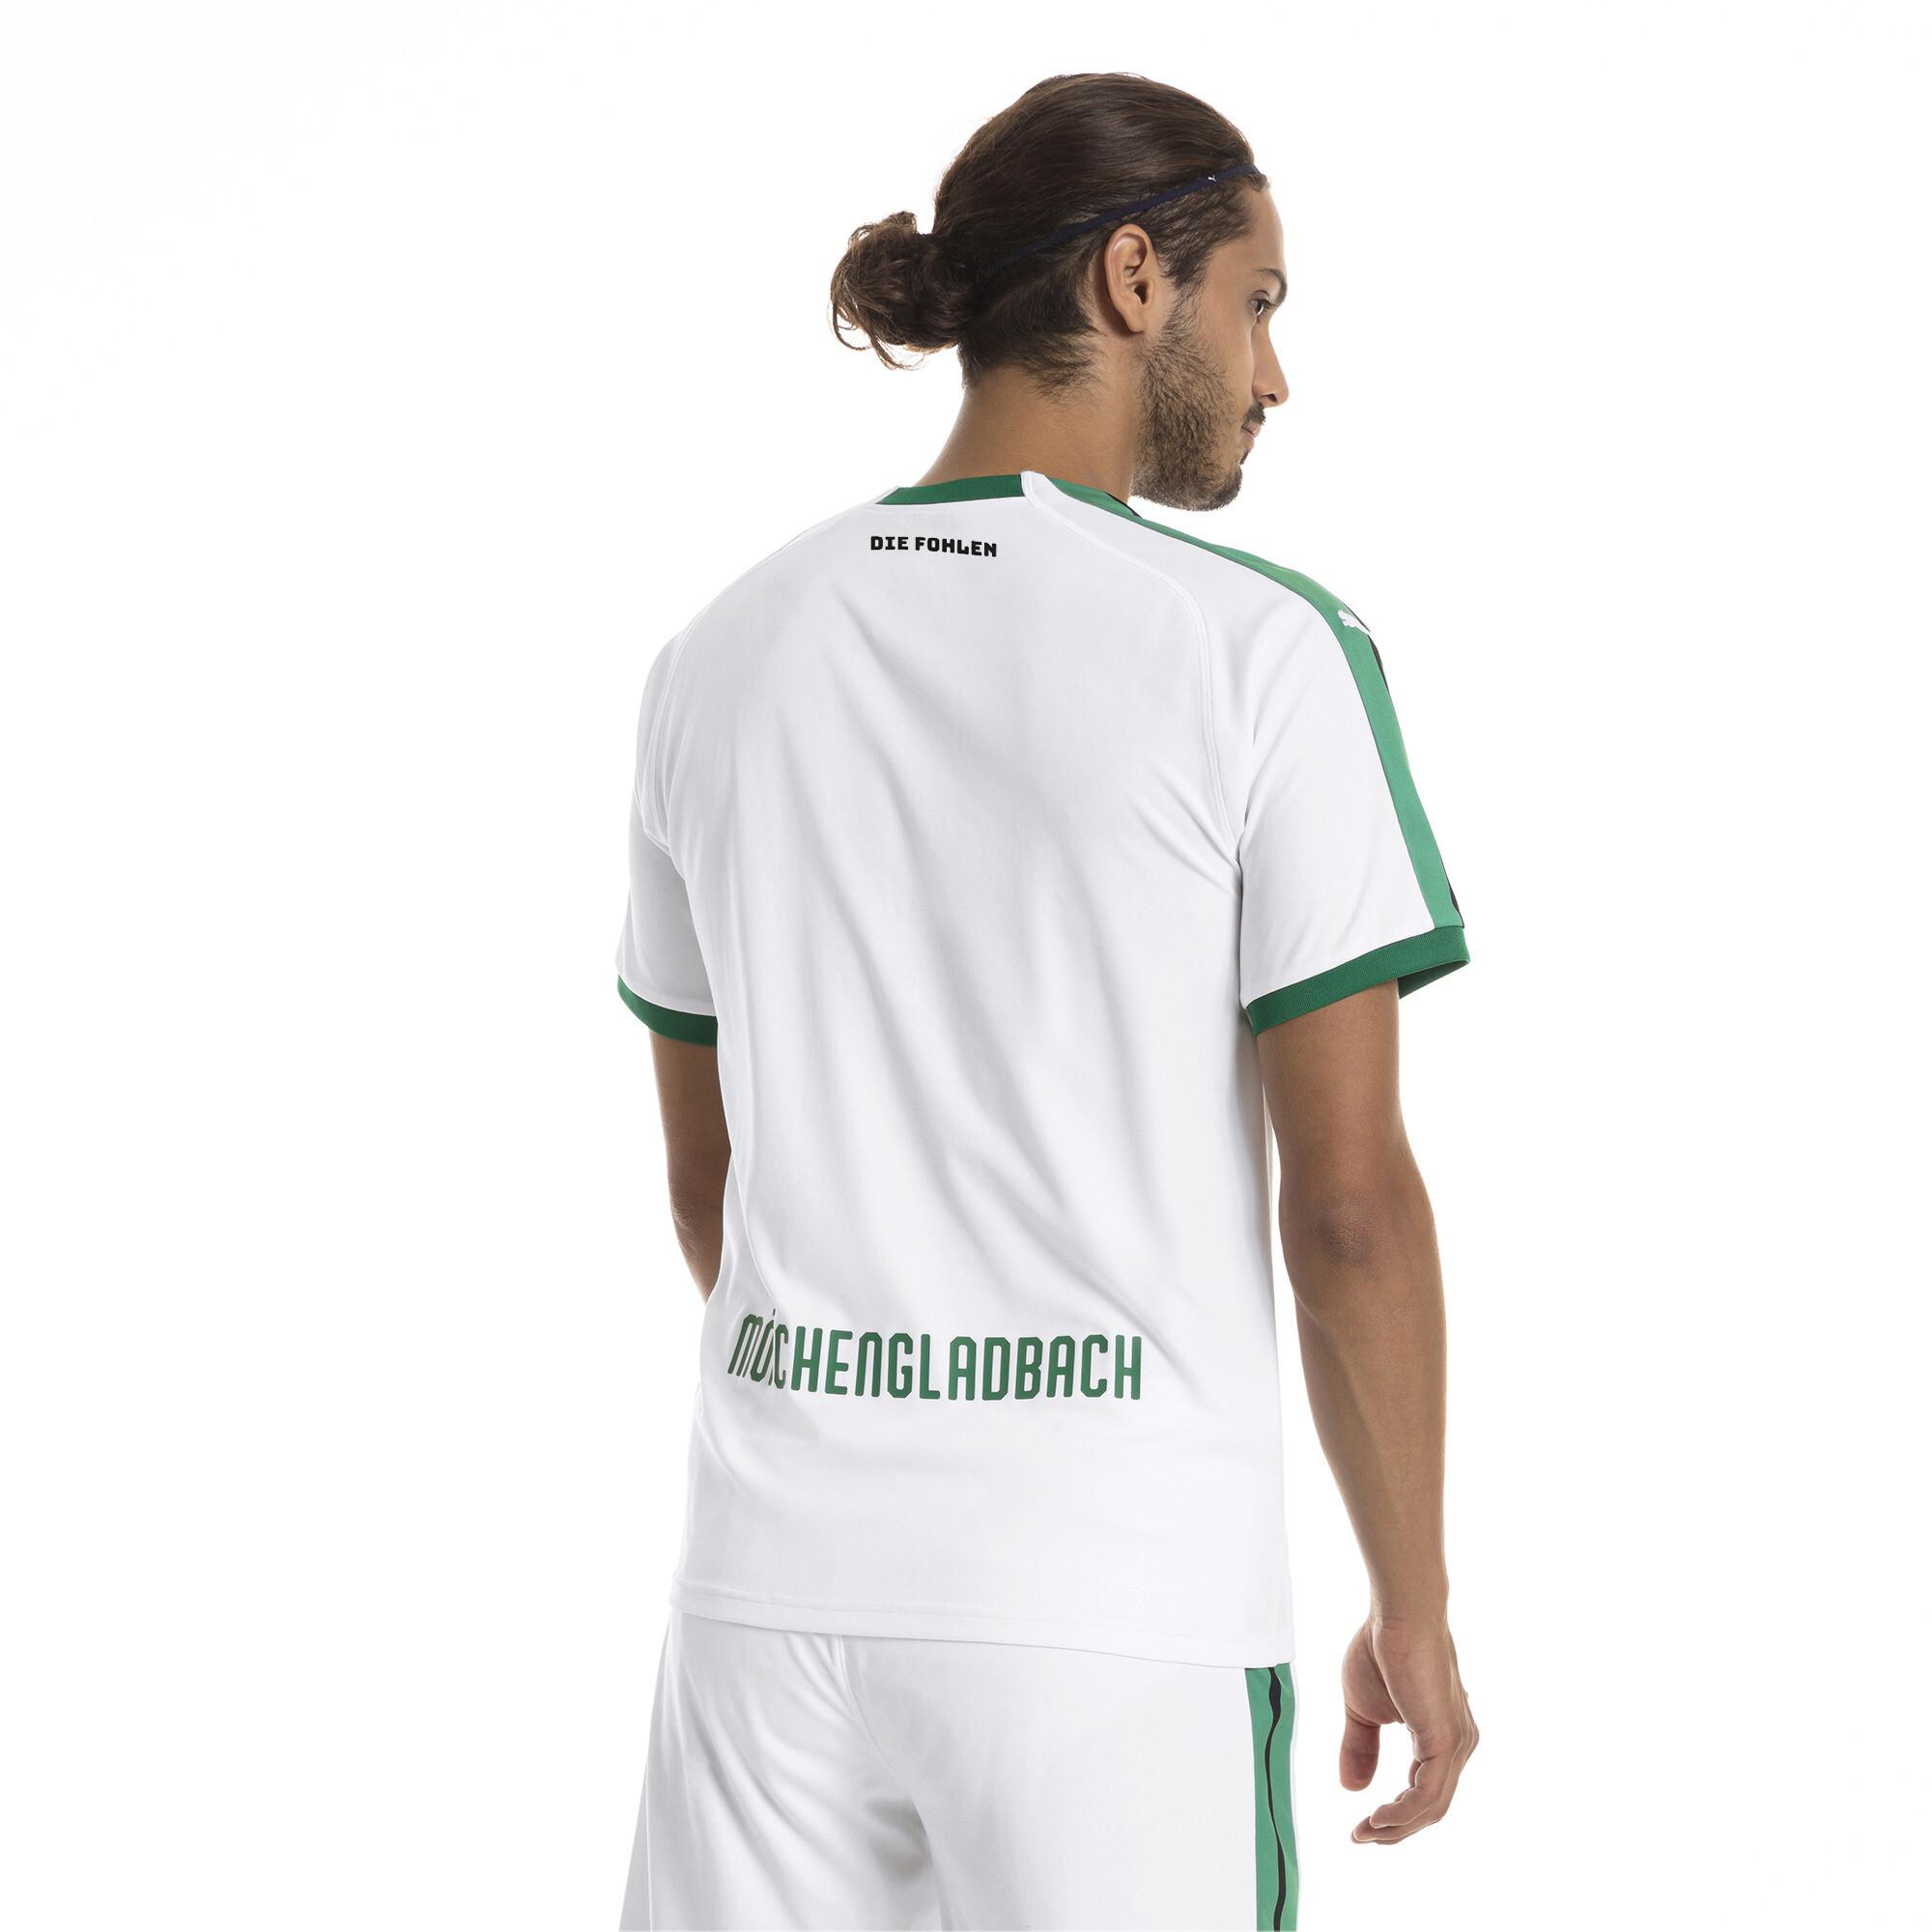 Indexbild 10 - PUMA Borussia Mönchengladbach Herren Replica Heimtrikot Männer Fußballtrikot Neu